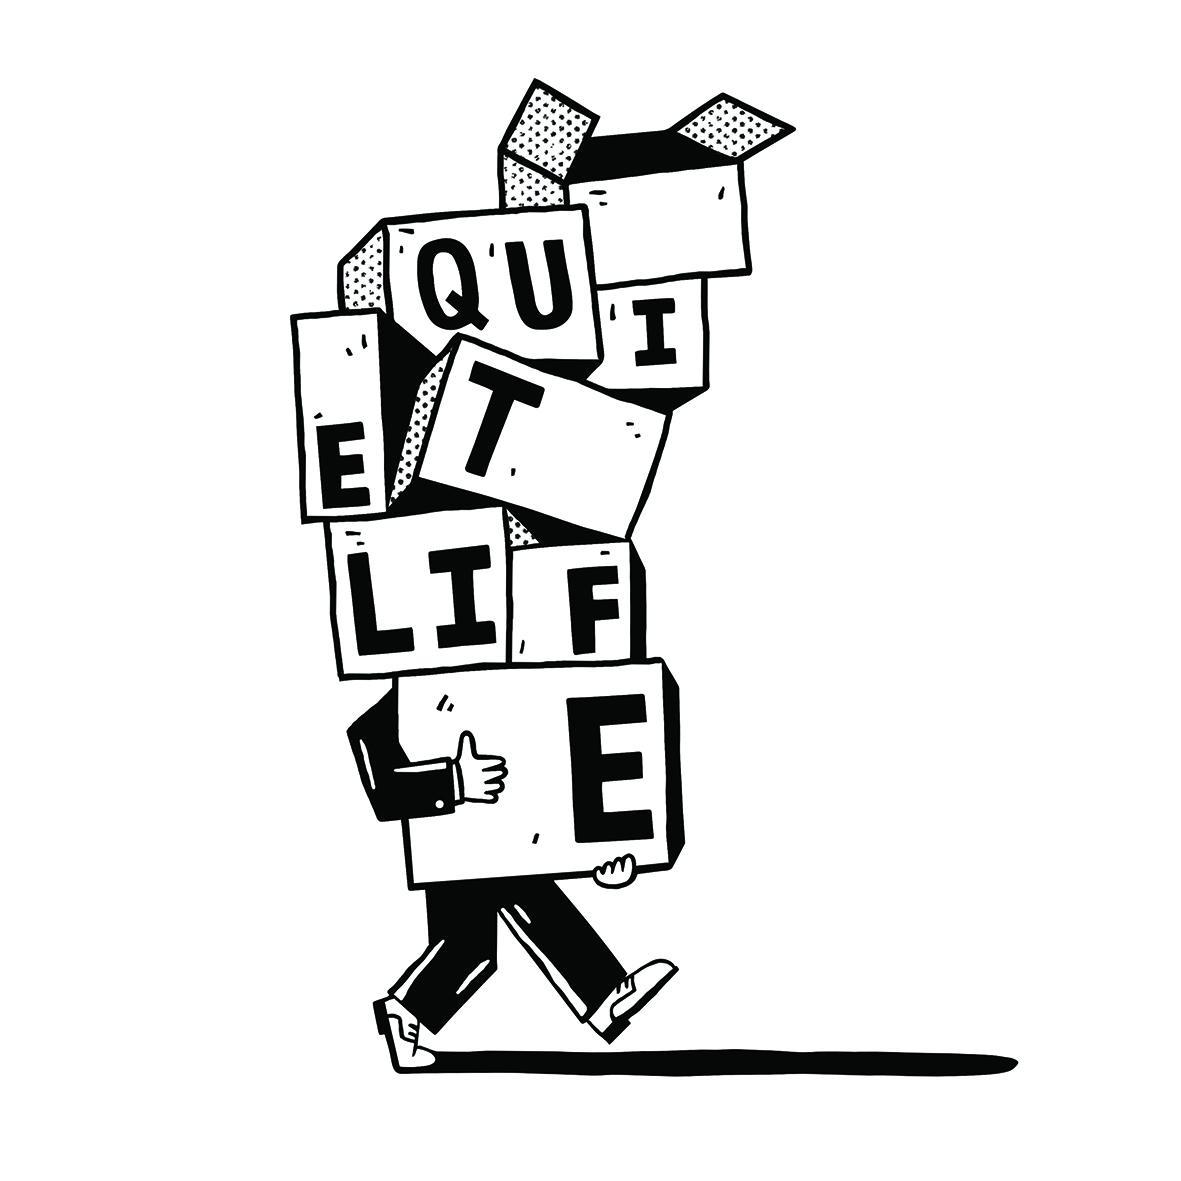 Quiet life.jpg